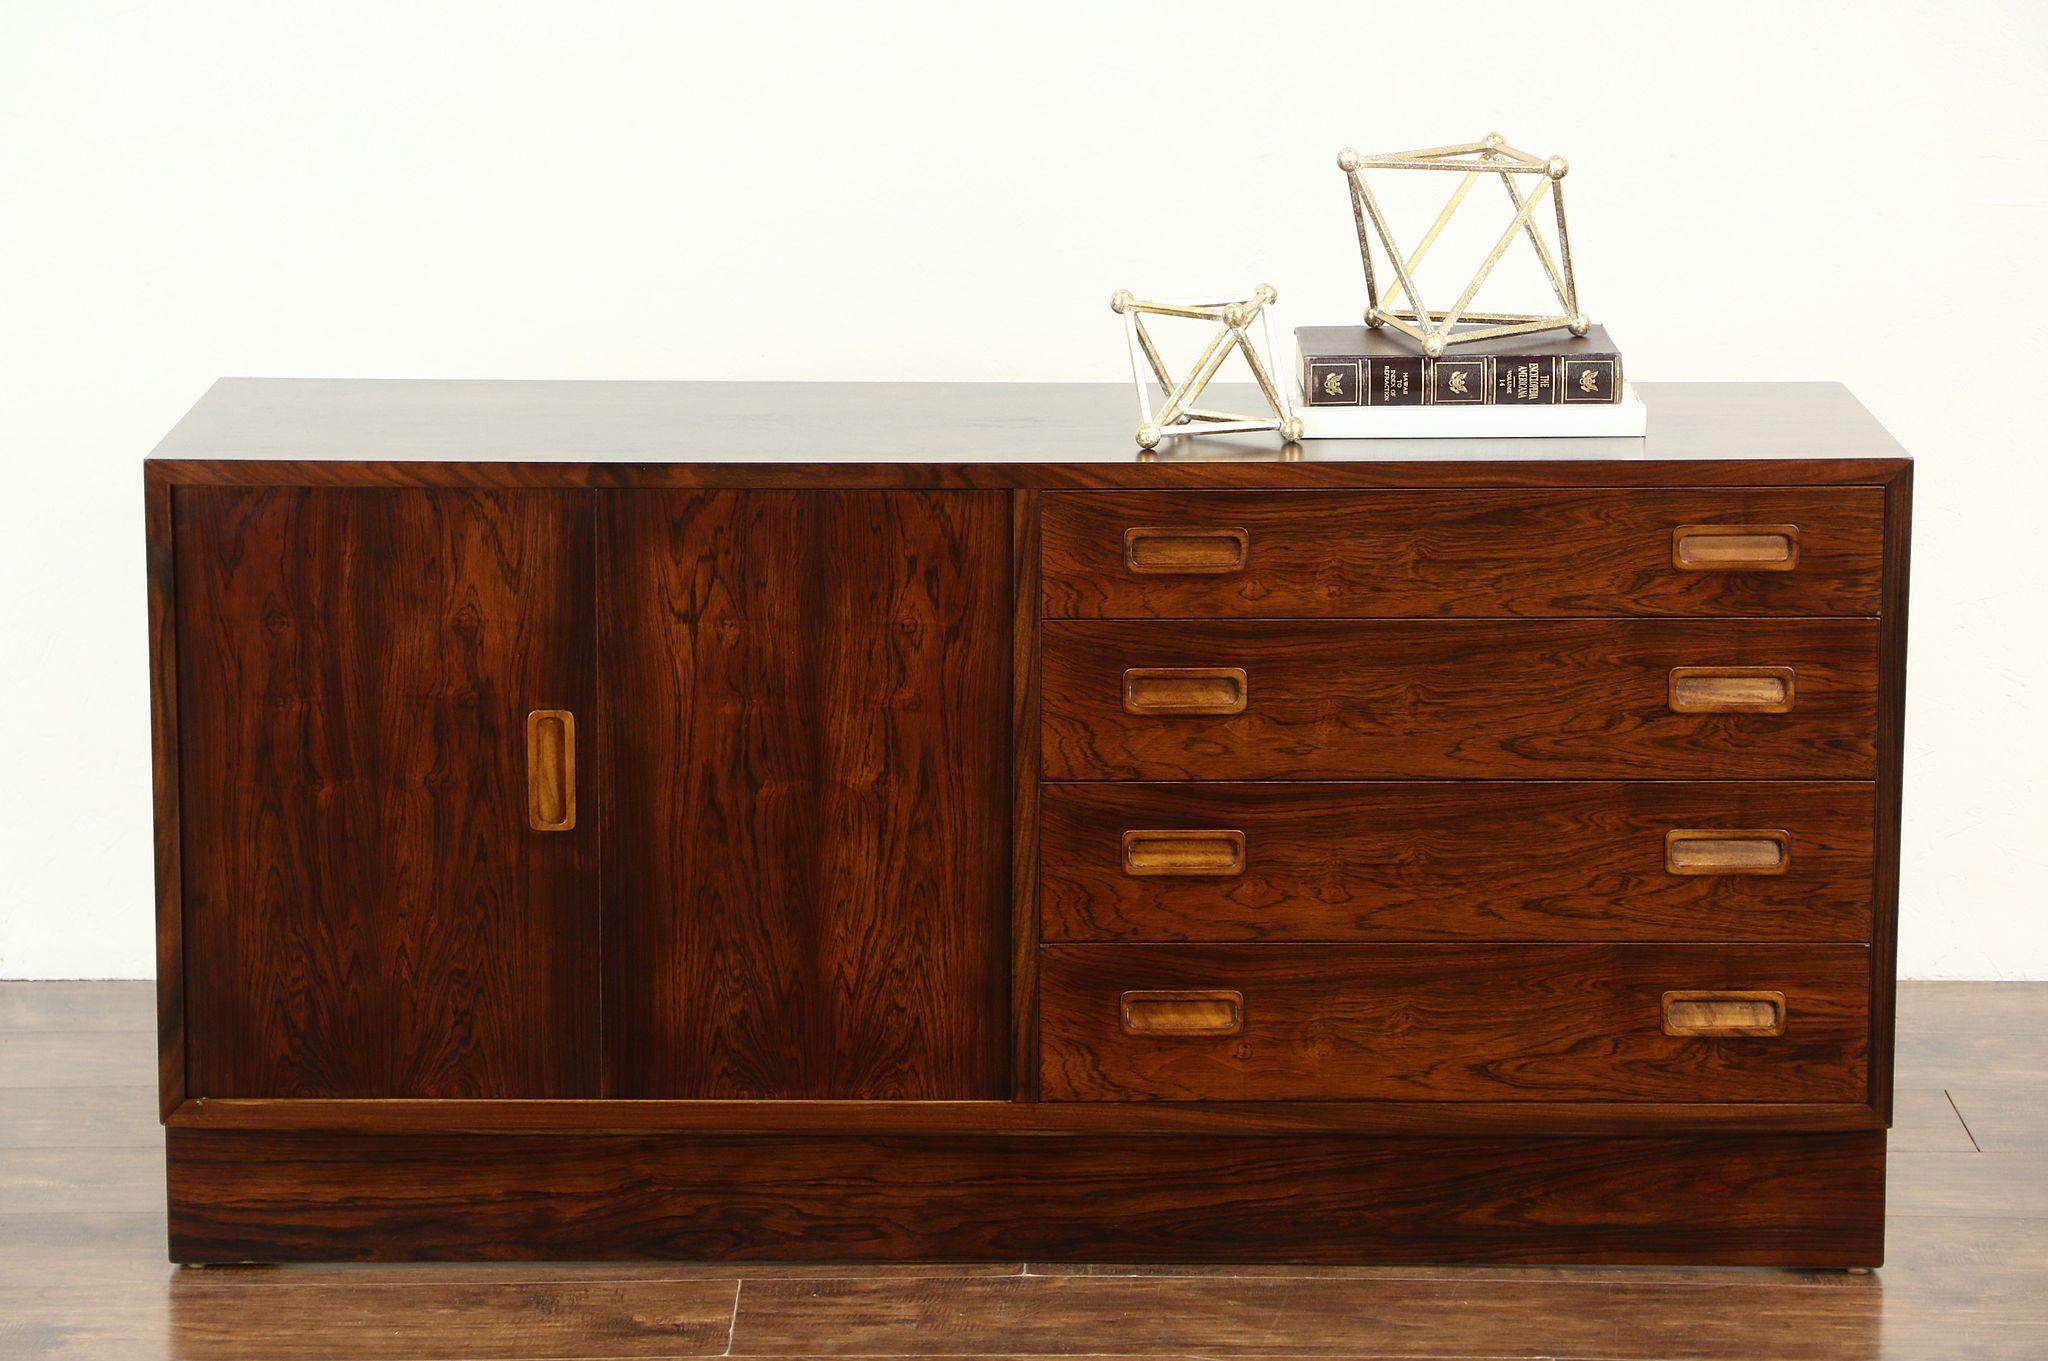 sold midcentury danish modern 60 39 s vintage rosewood sideboard or tv console cabinet harp gallery. Black Bedroom Furniture Sets. Home Design Ideas